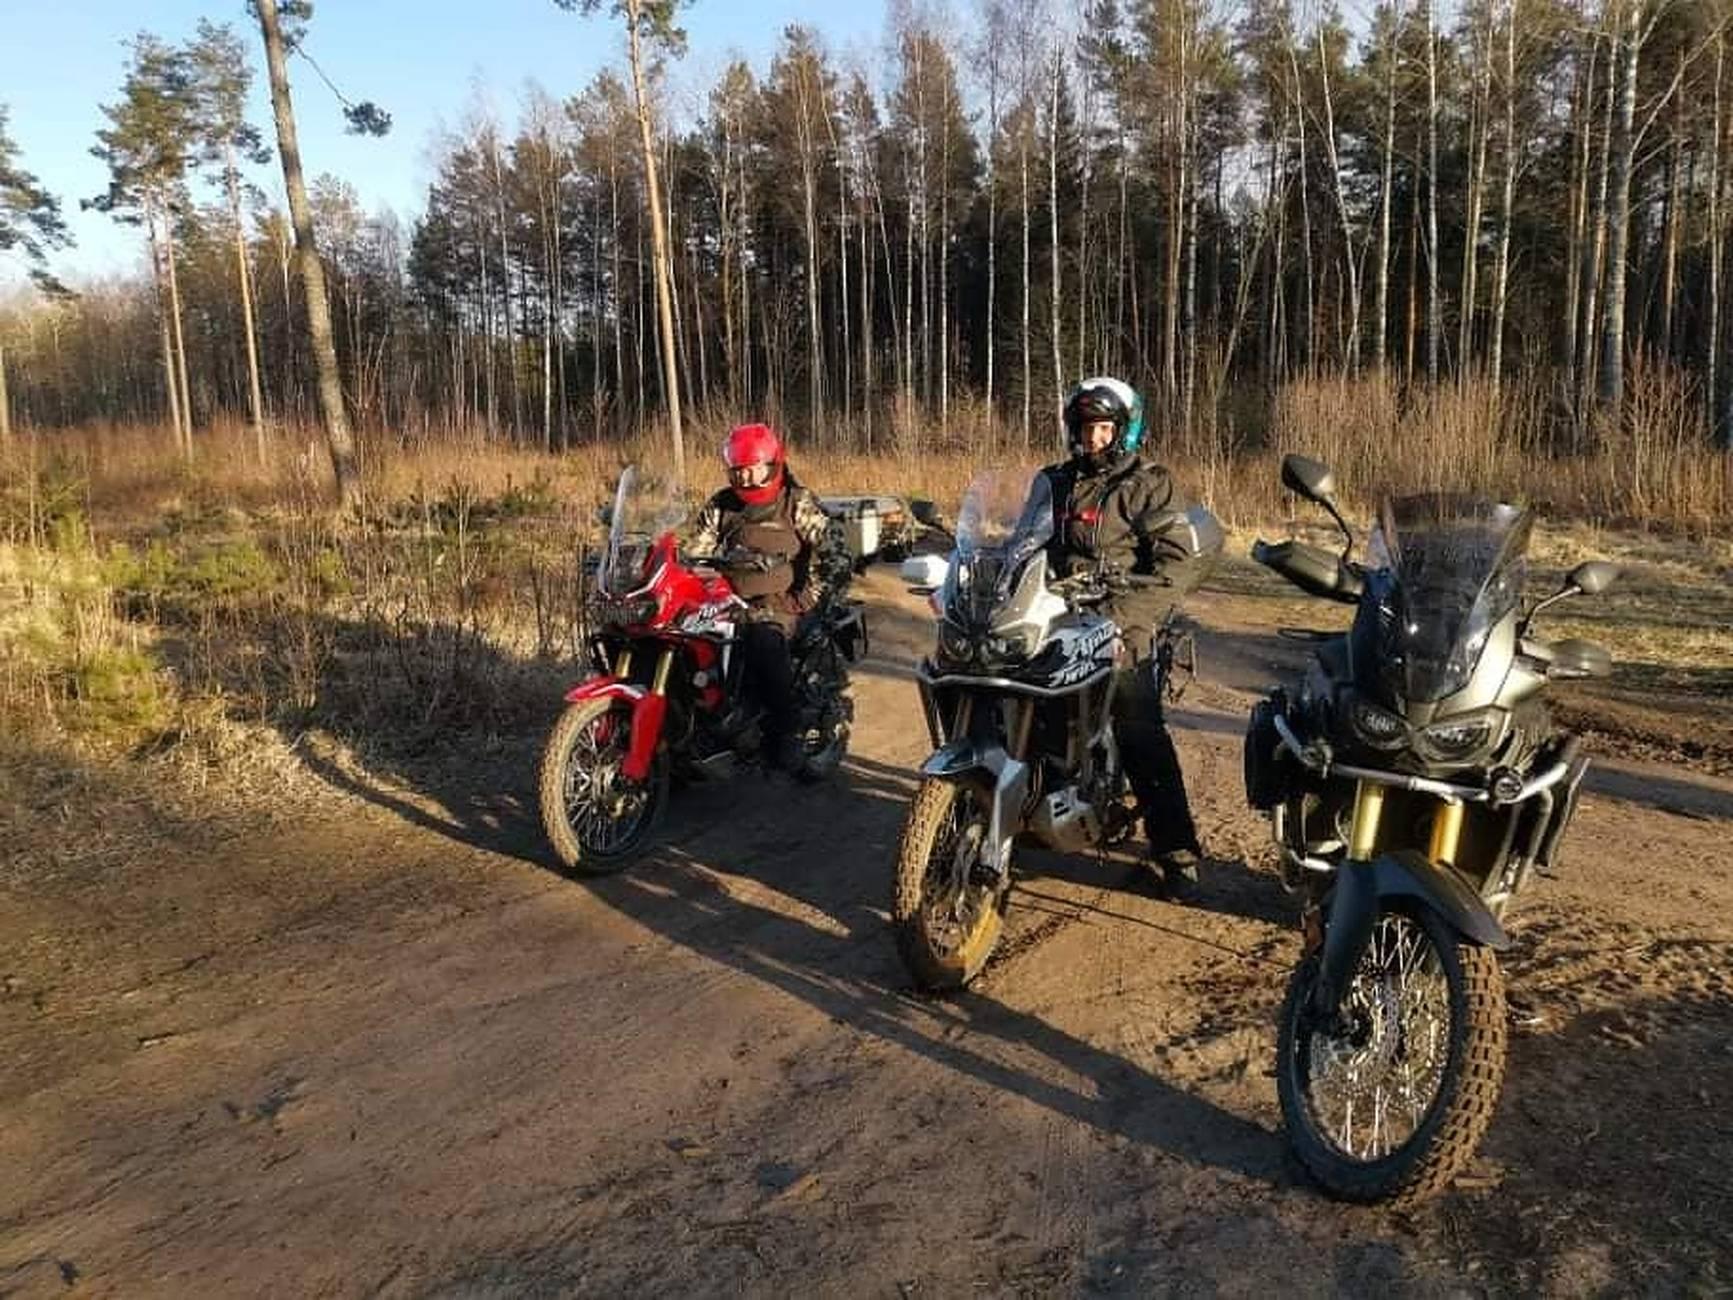 safari bikes view